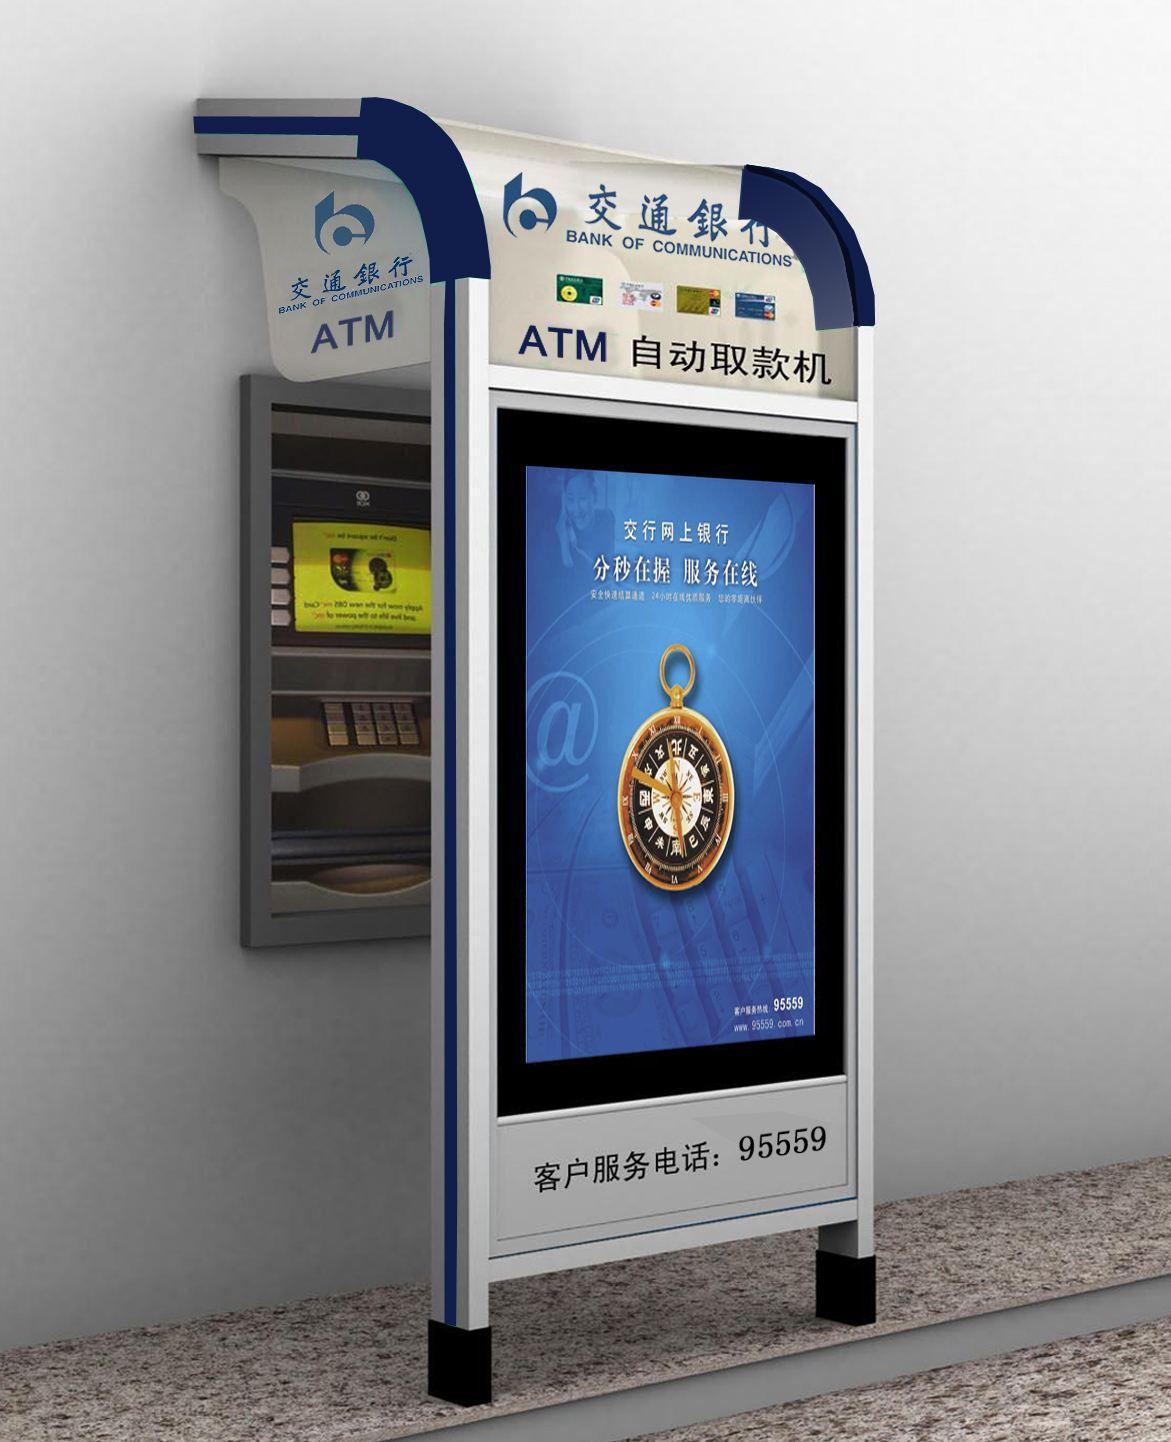 ATM365bet手机投注开户_365bet滚球_365bet足球赛事供求信息